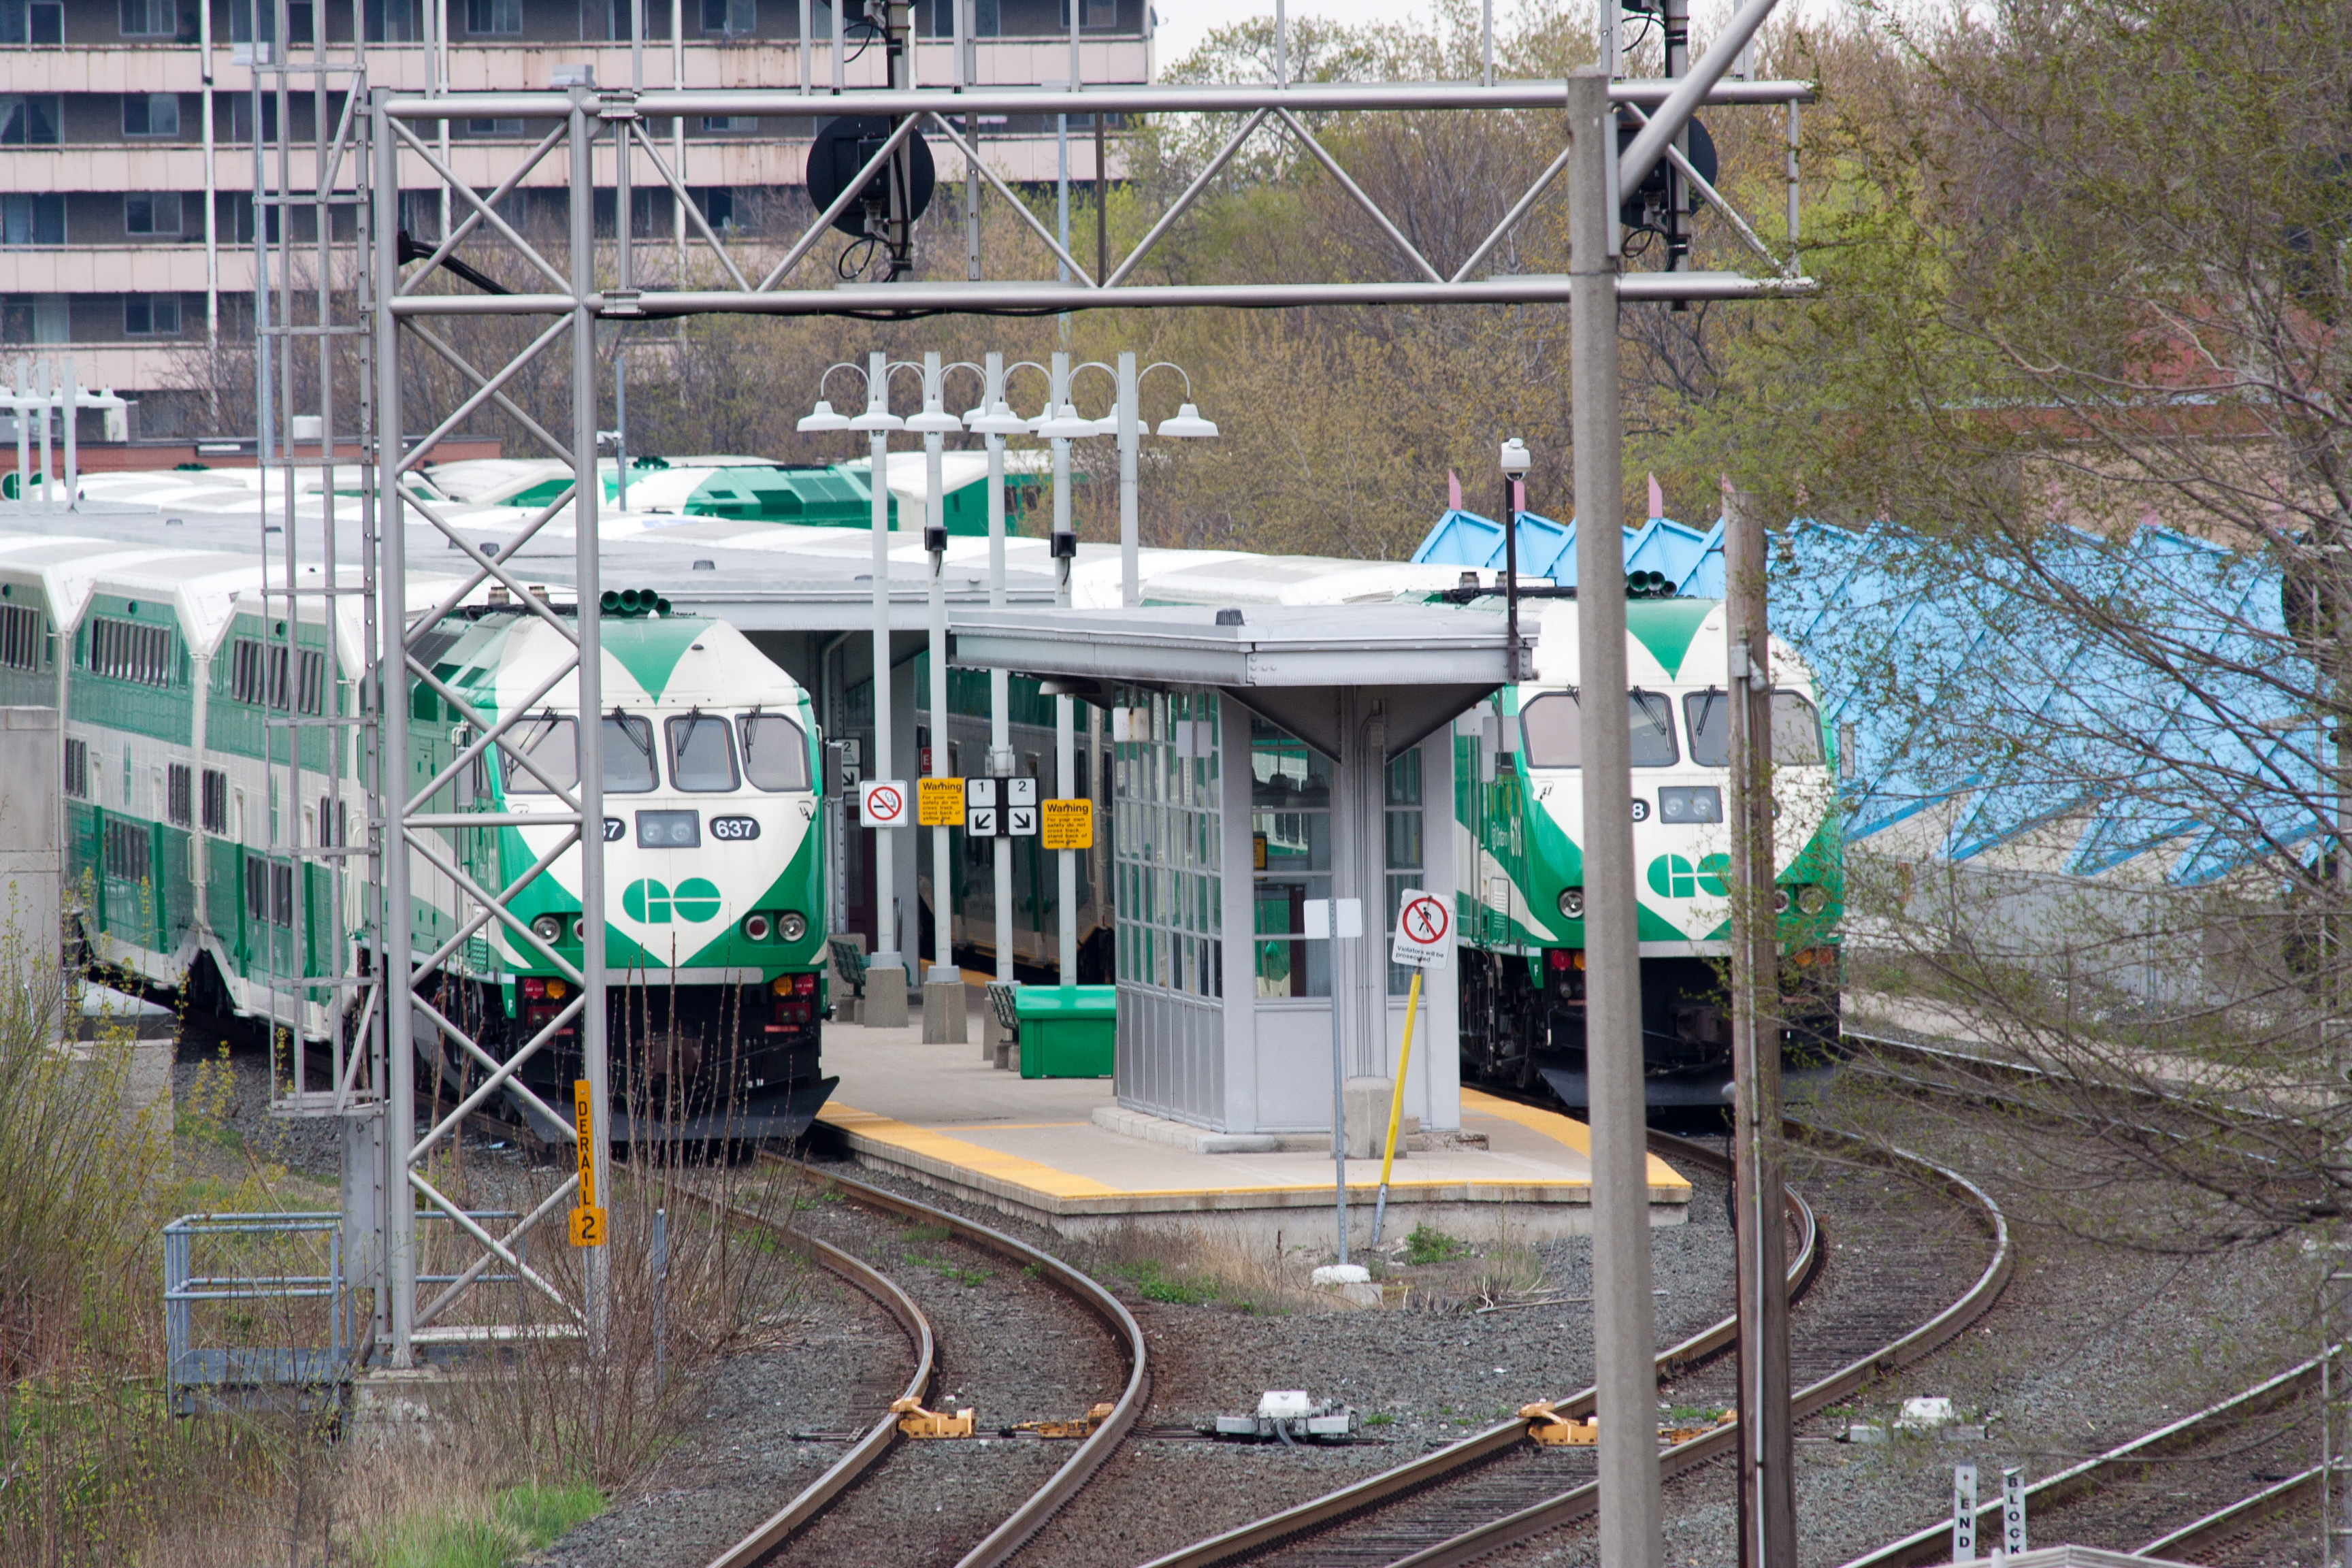 File:Hamilton GO Centre layover trains.jpg - Wikimedia Commons